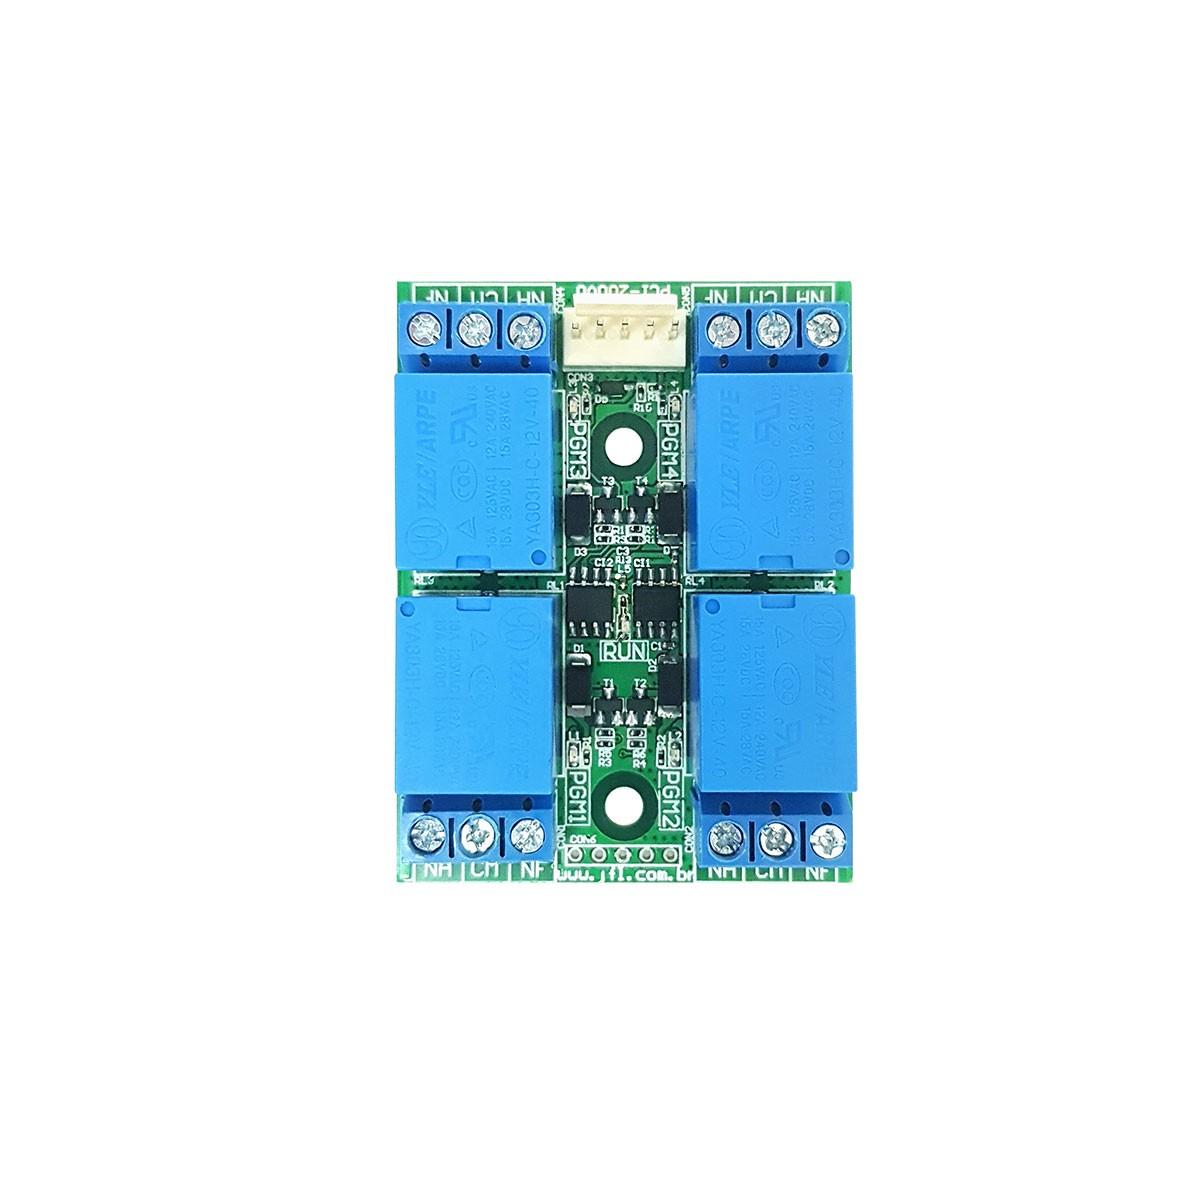 Kit Alarme Jfl Smartcloud 18 Com Modulo Ethernet E Sensores